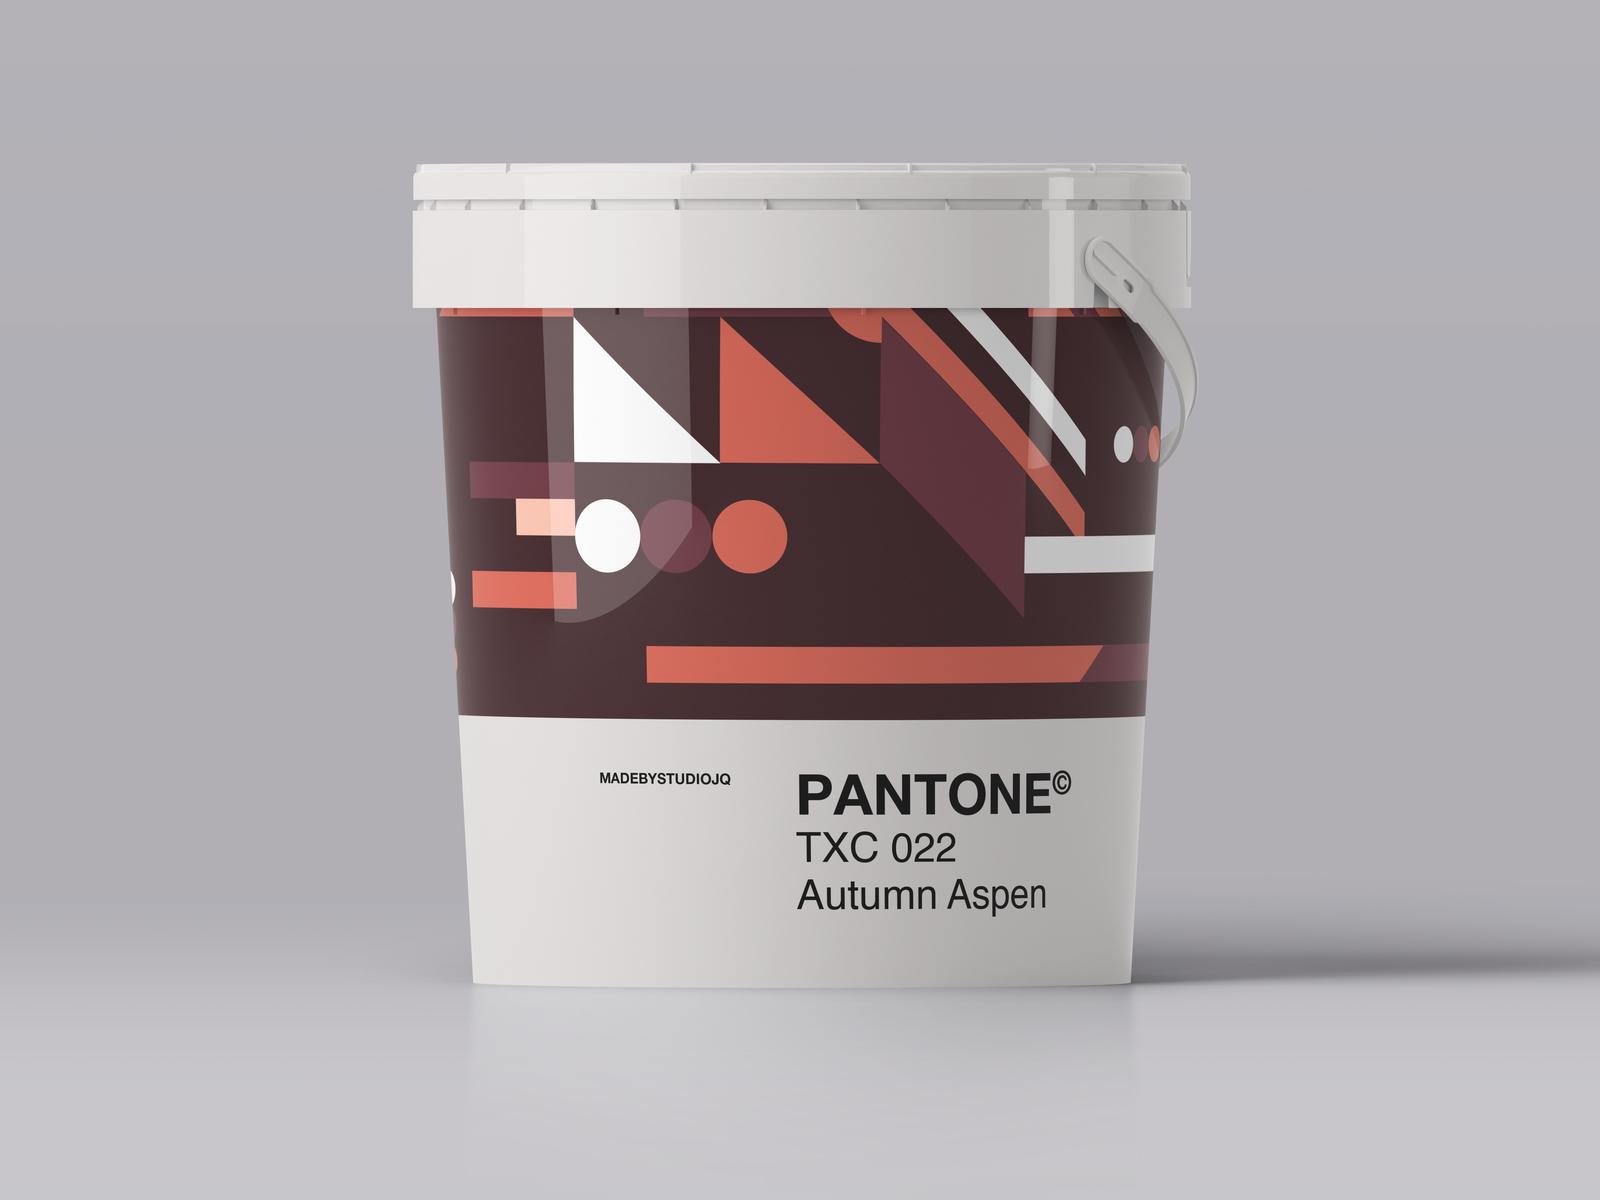 Pantone paint autumnaspen 4x